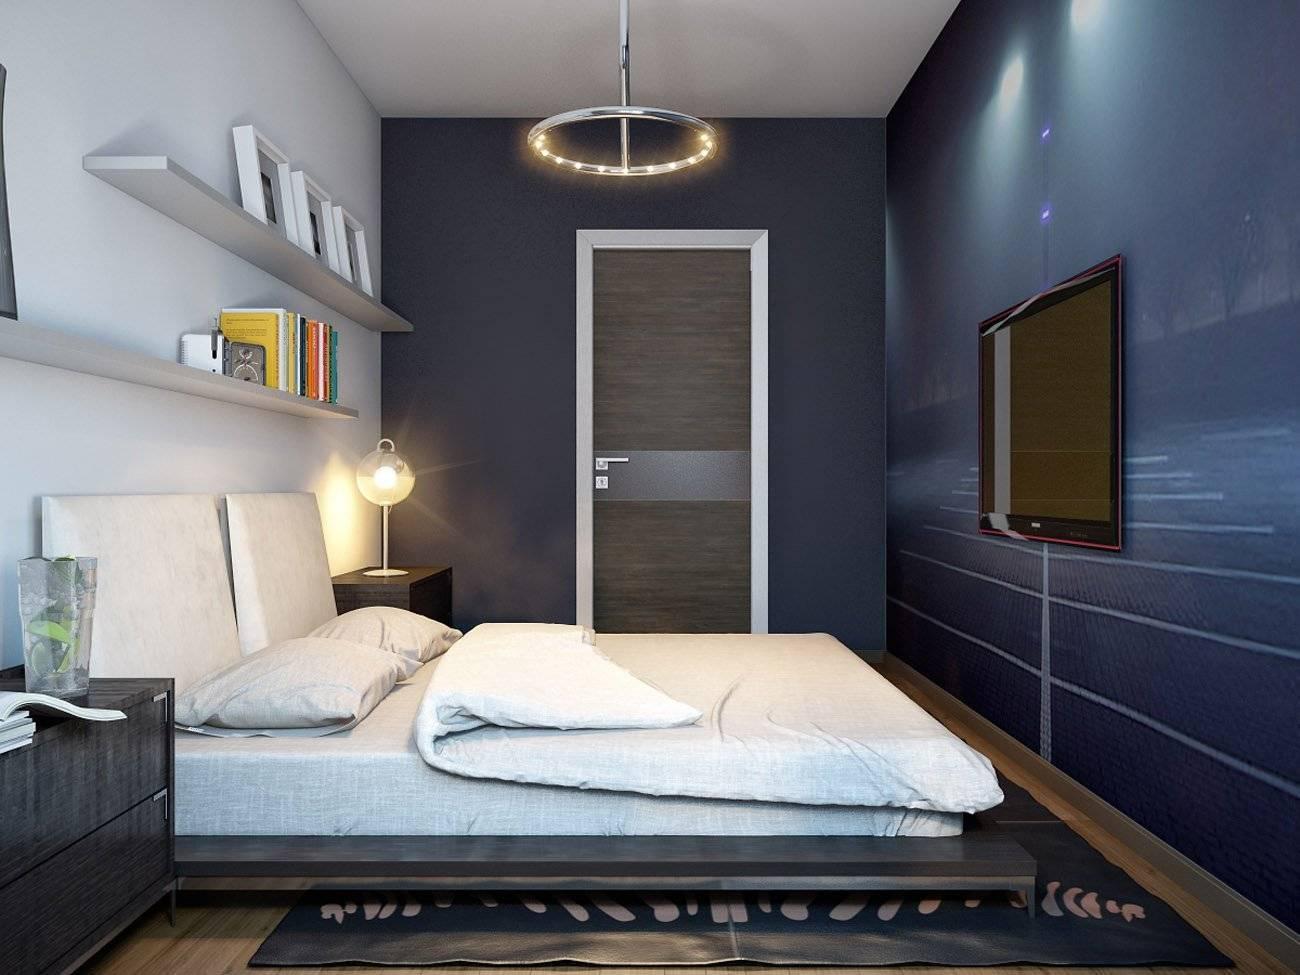 Дизайн комнаты без окон